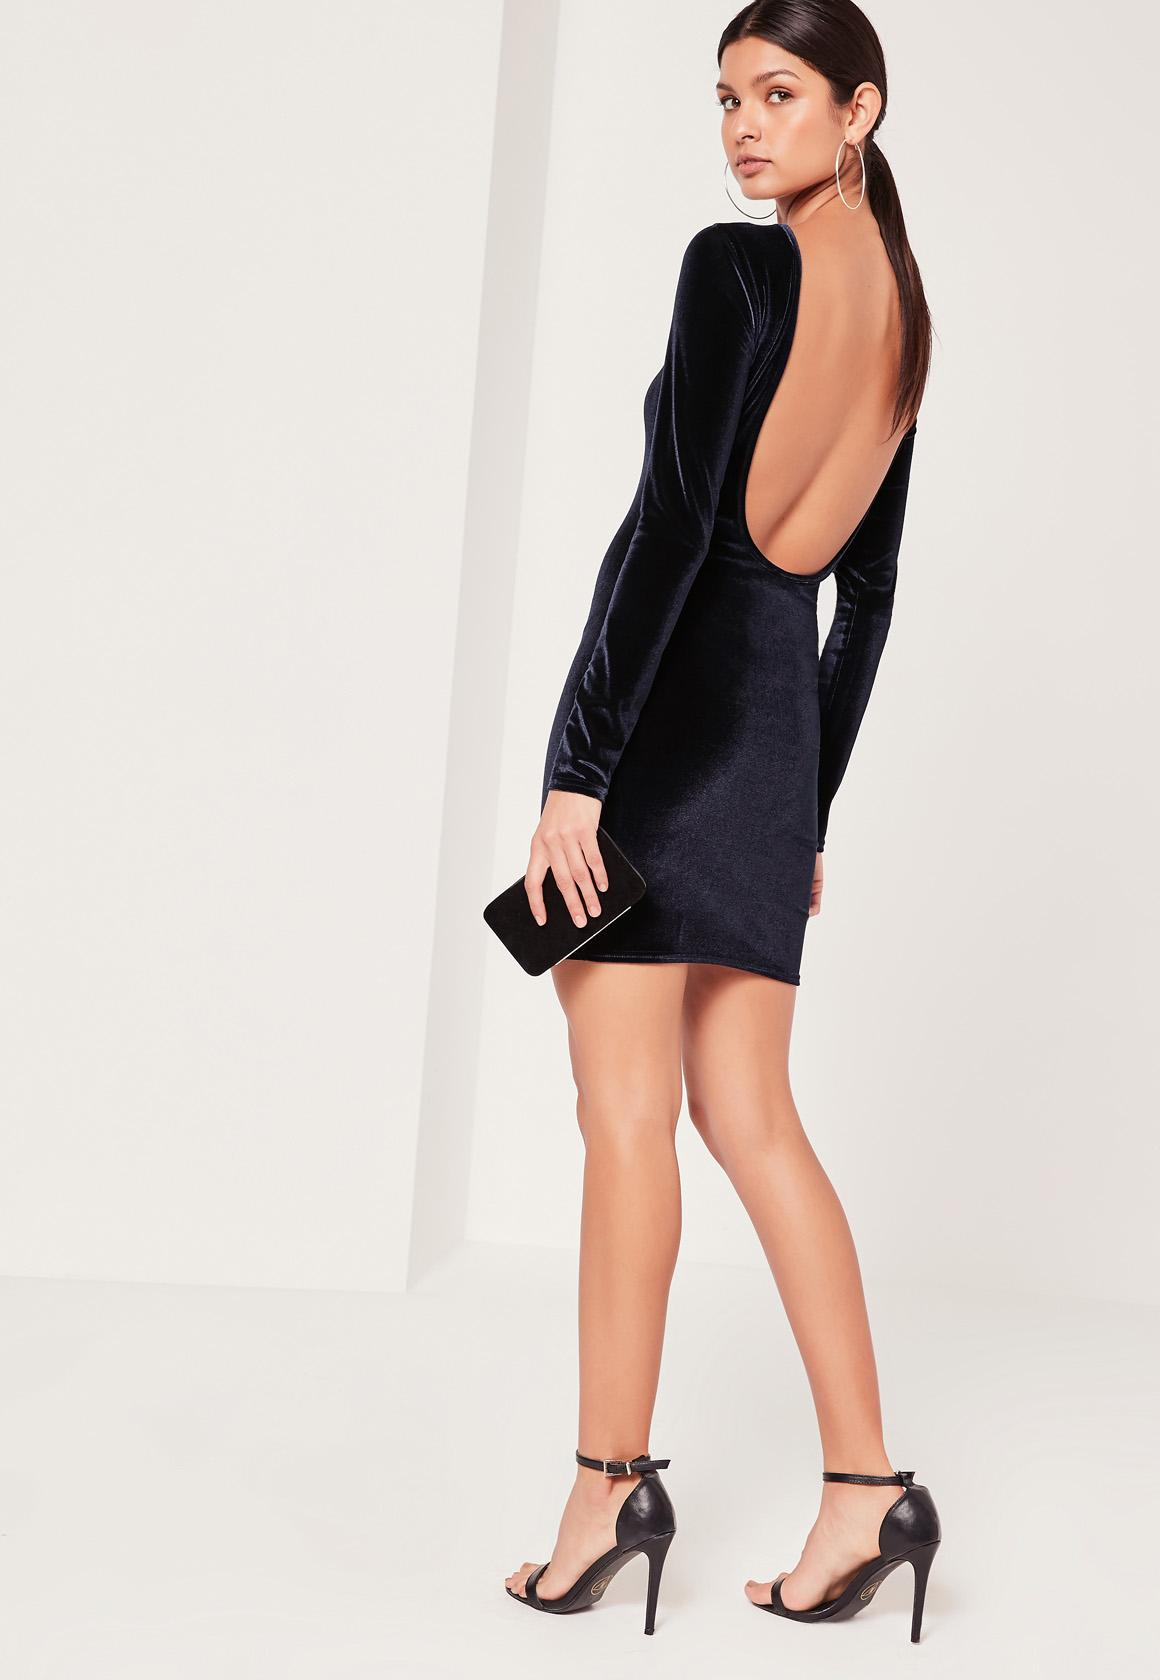 Low Back Cocktail Dress